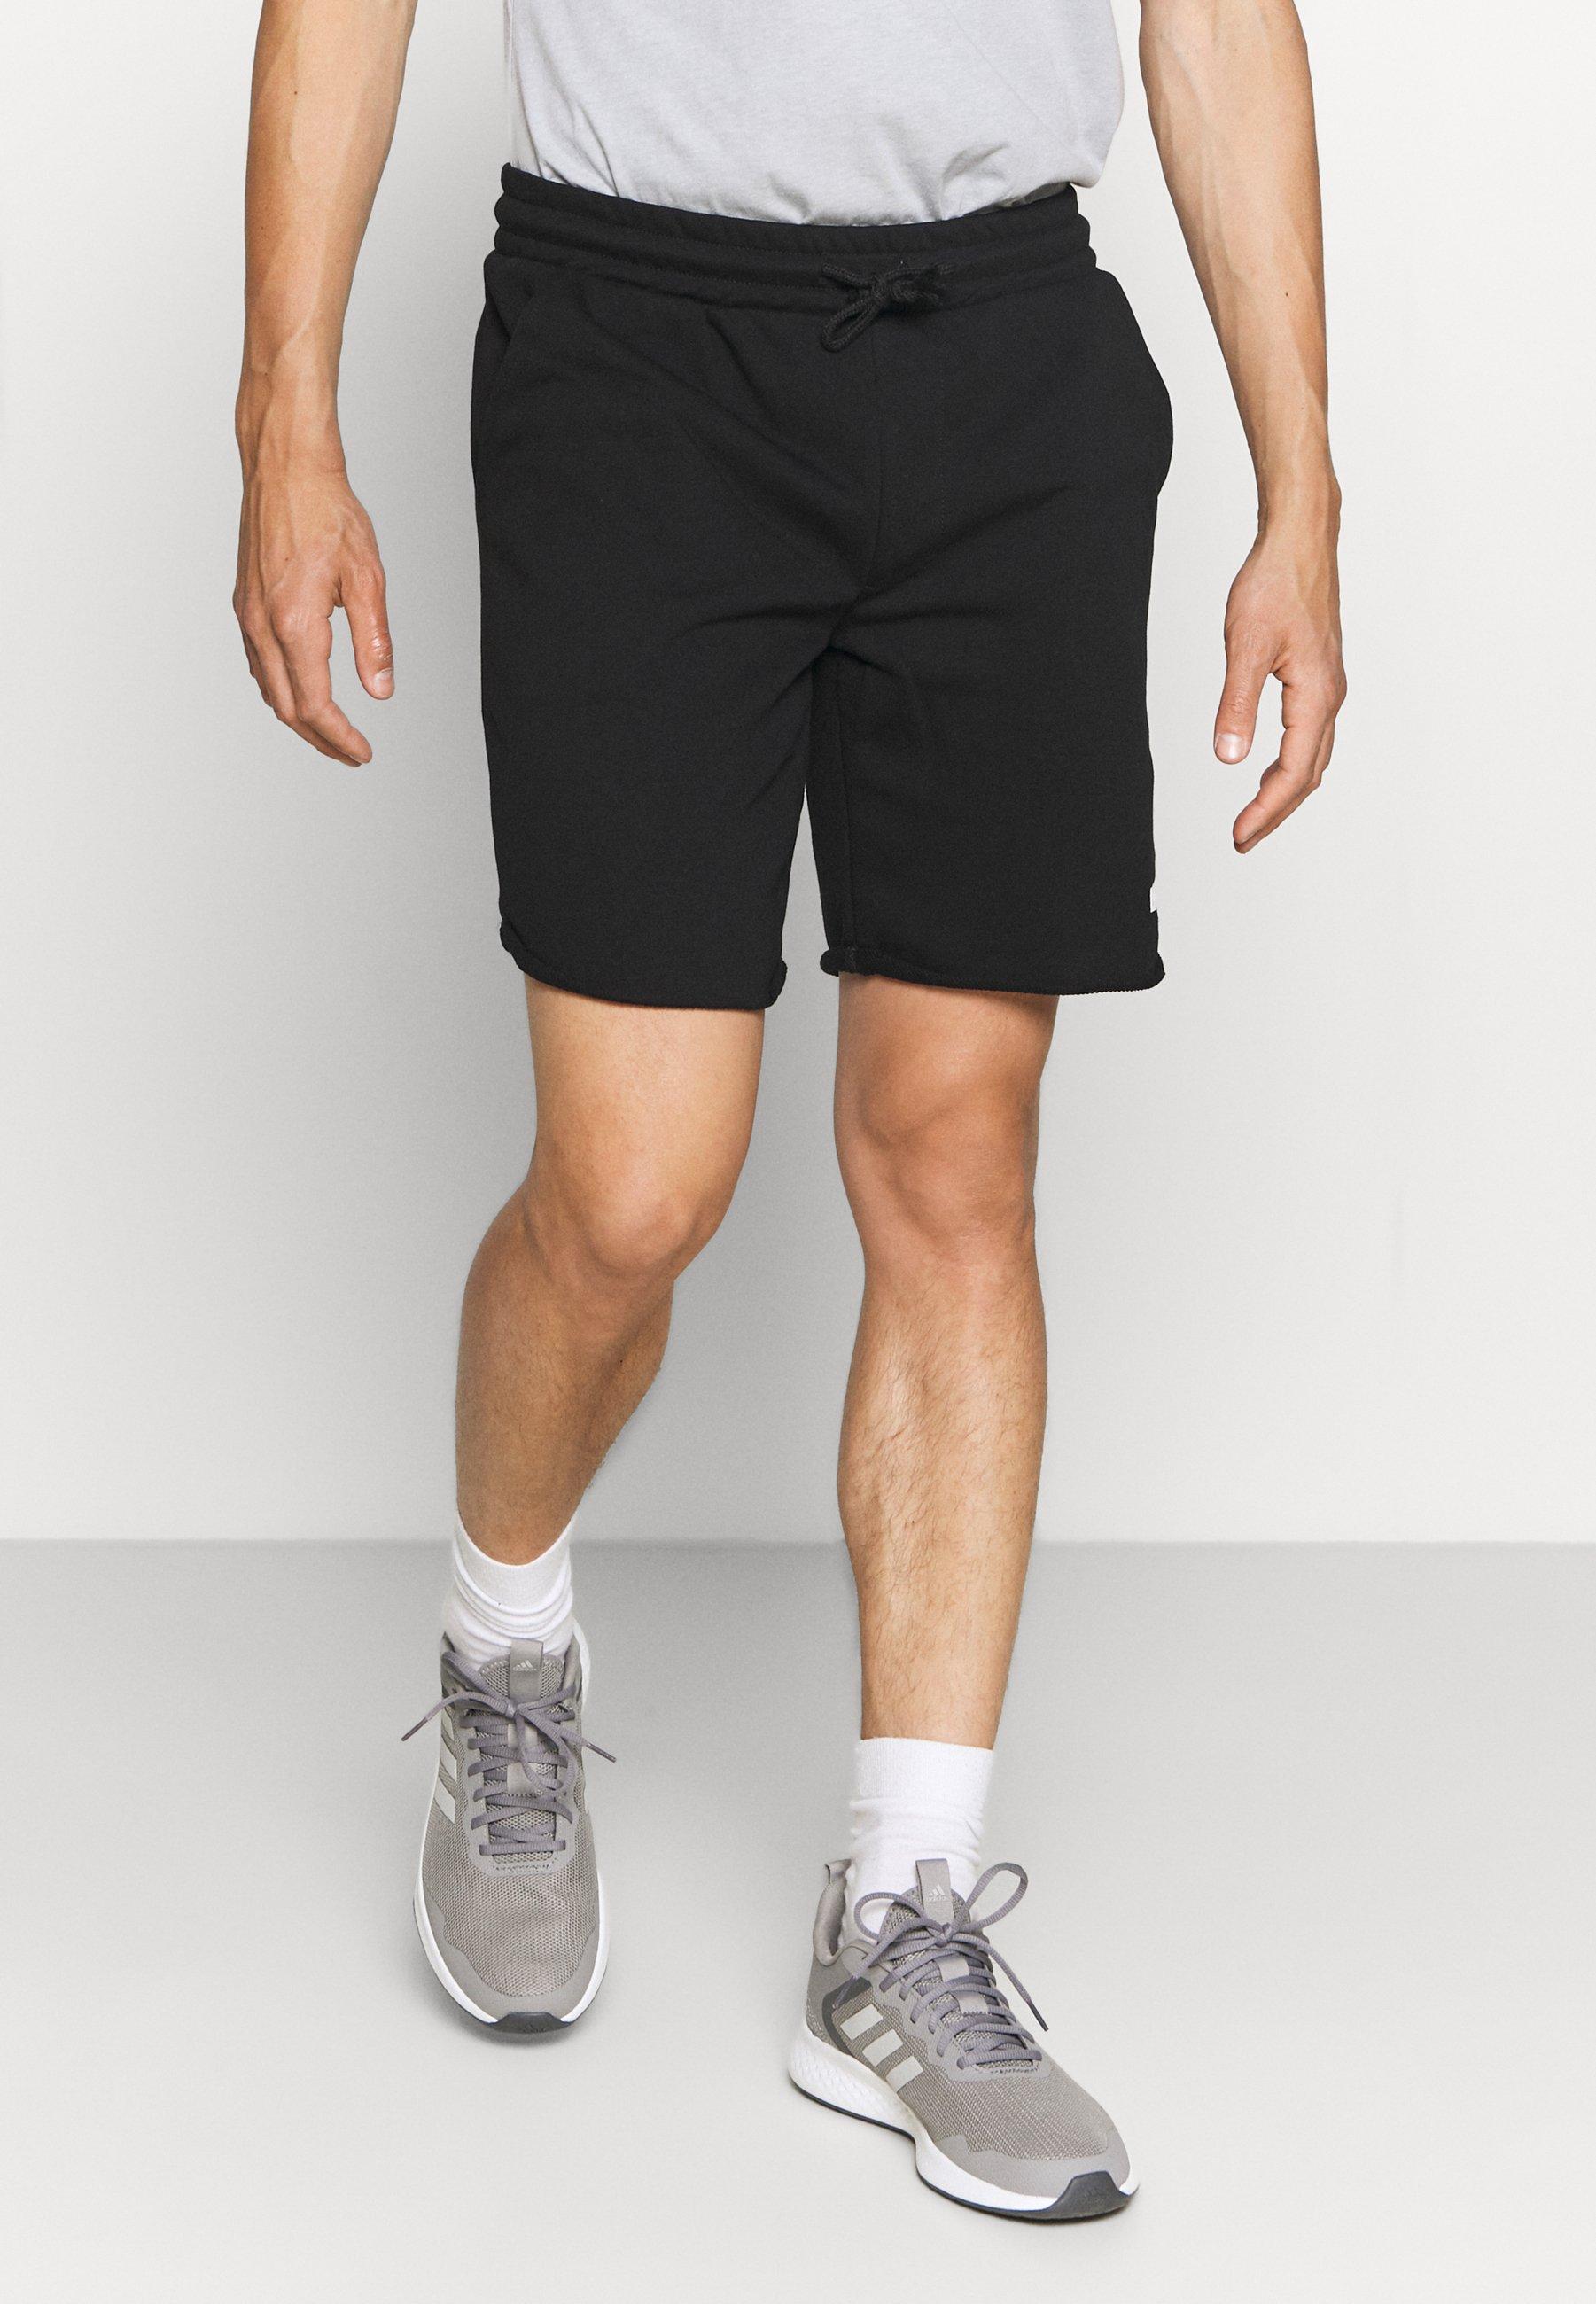 Uomo JJIZFRENCH TERRY SHORTS - Pantaloncini sportivi